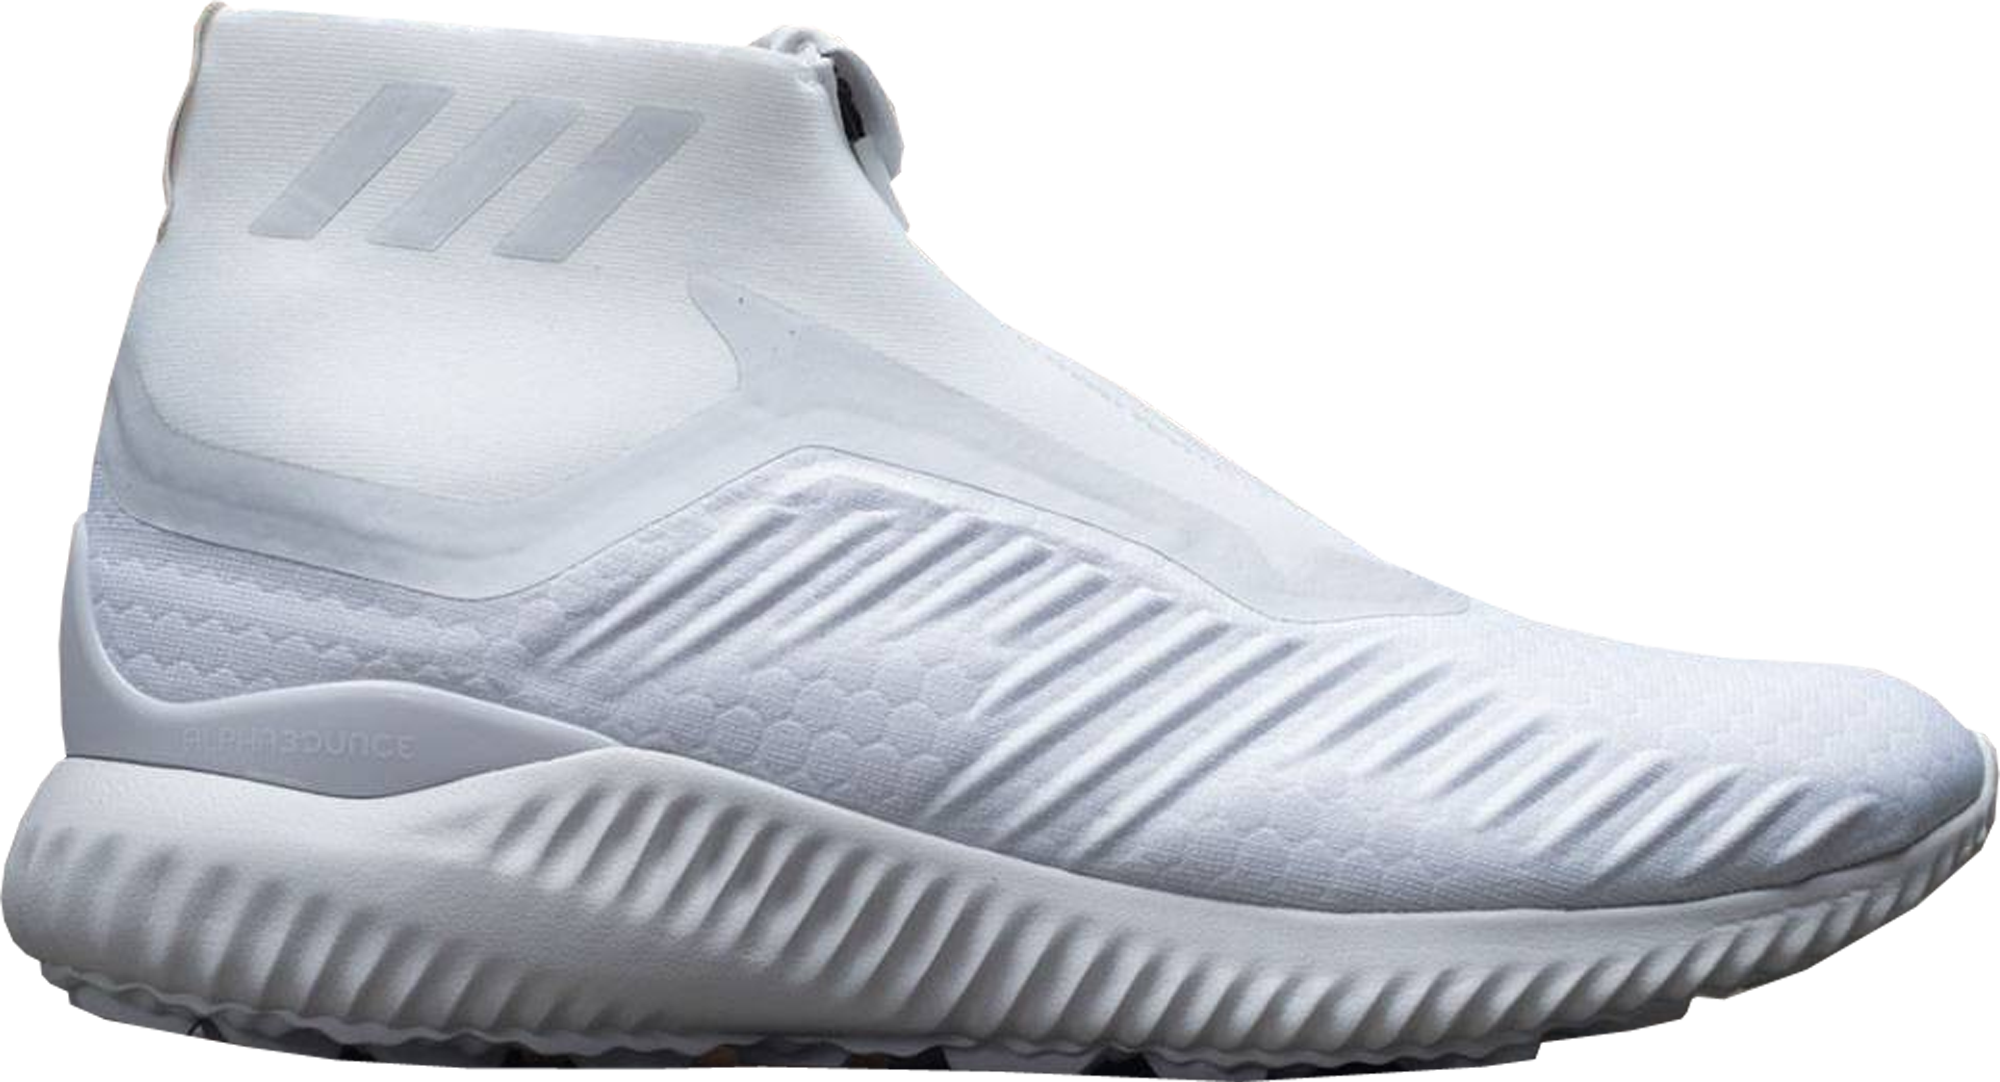 adidas Alphabounce Zip Triple White